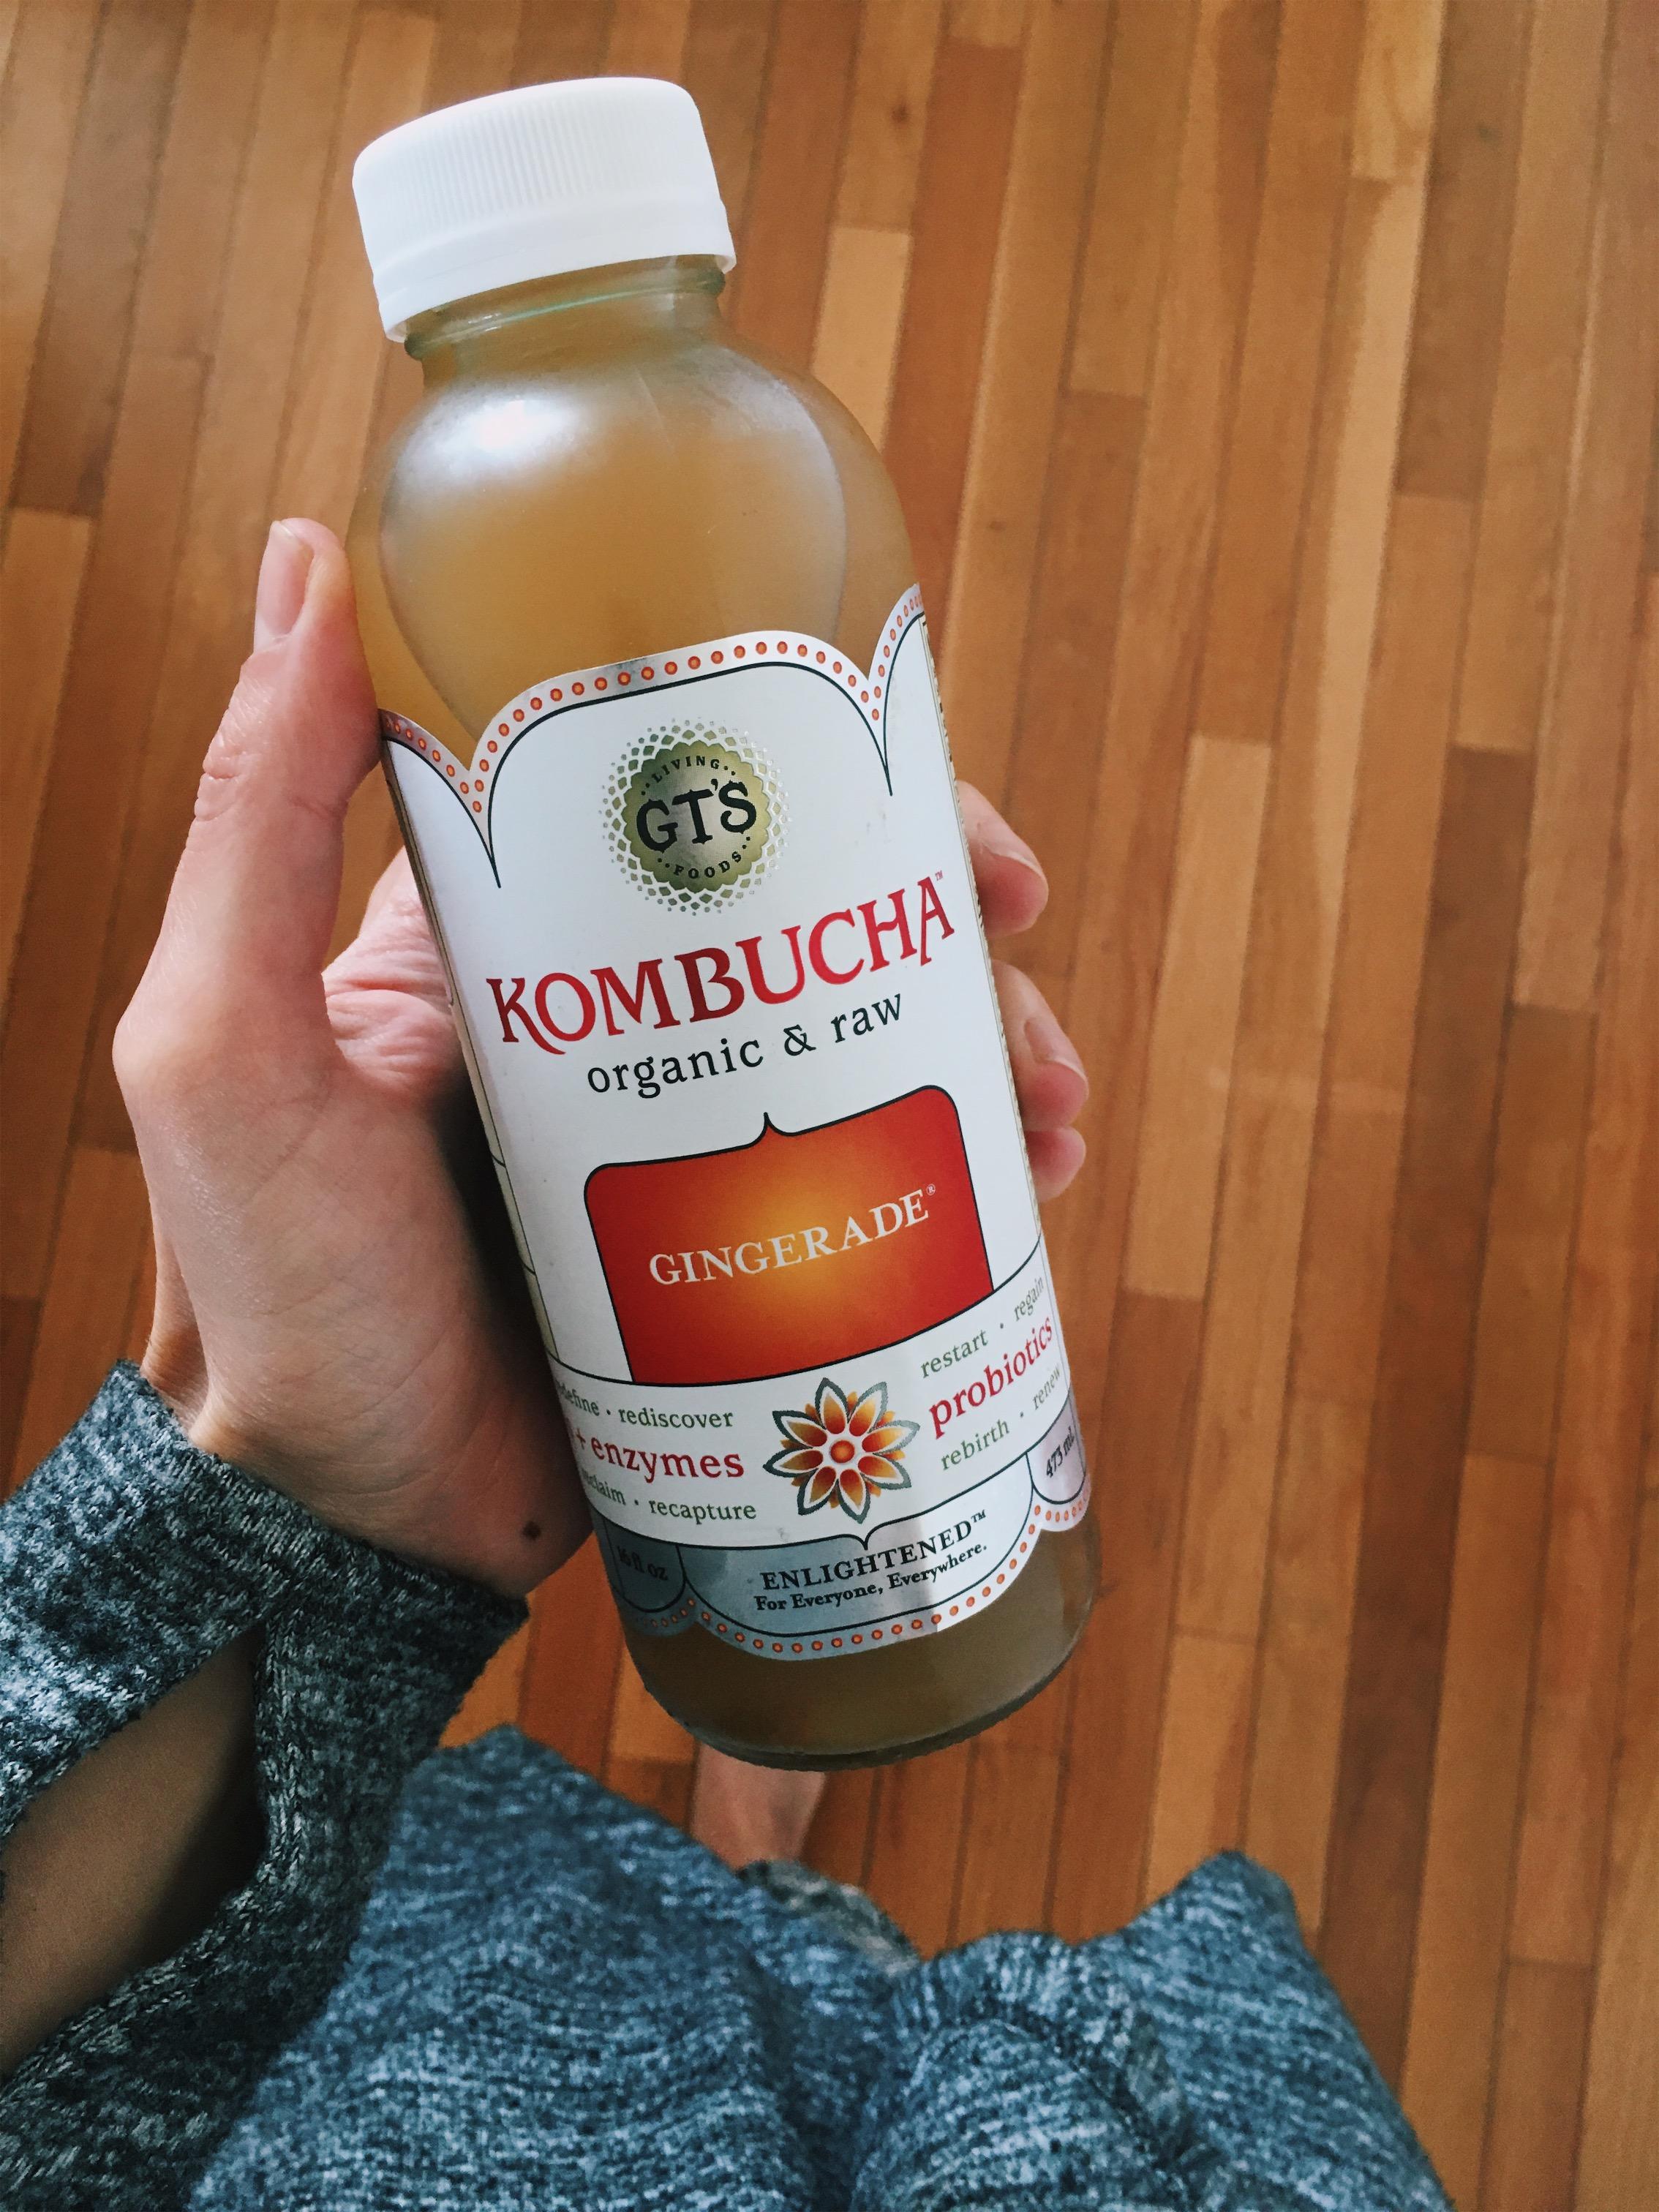 3:15 pm - bottle gingerade  kombucha